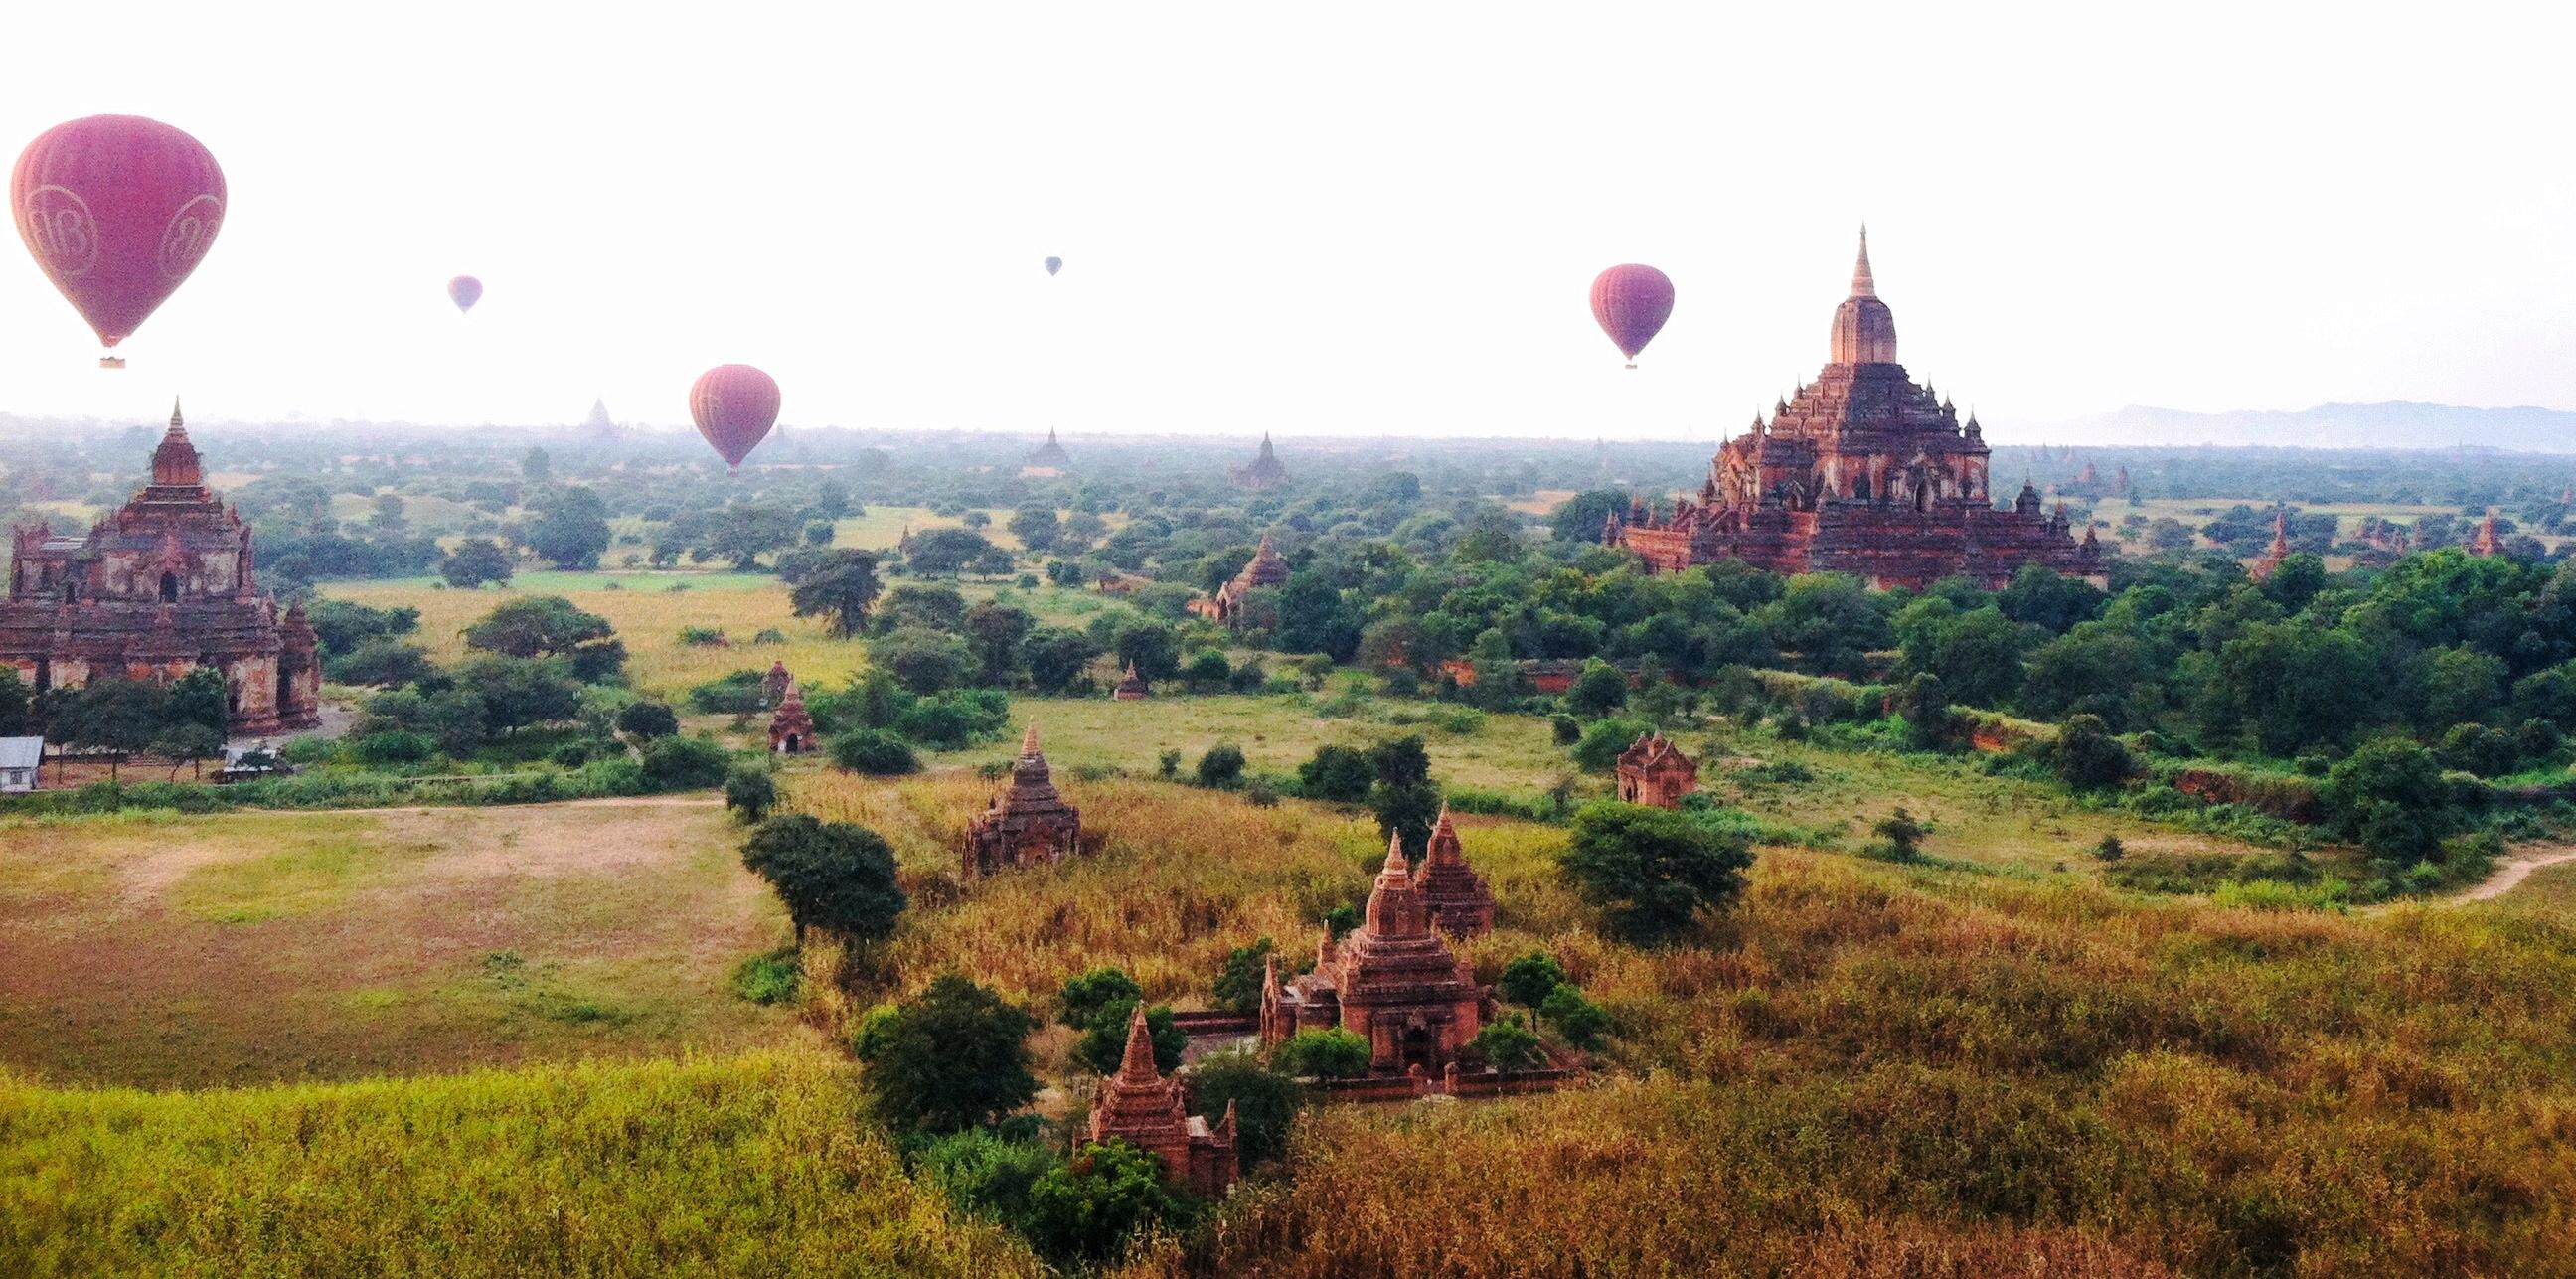 incentive travel, Incentive Travel